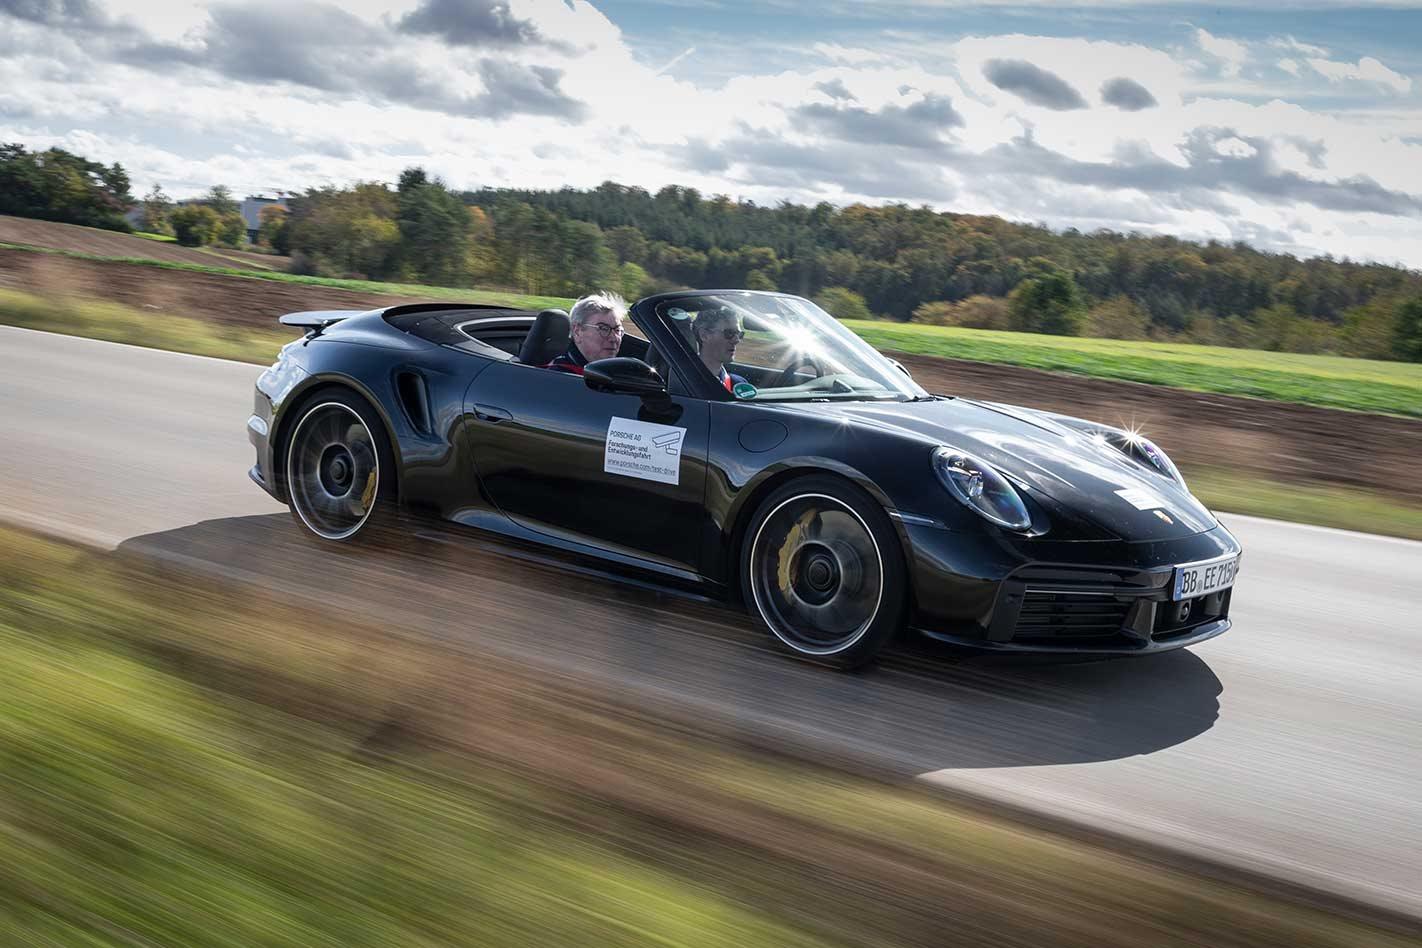 2020 Porsche 992 911 Turbo S Details